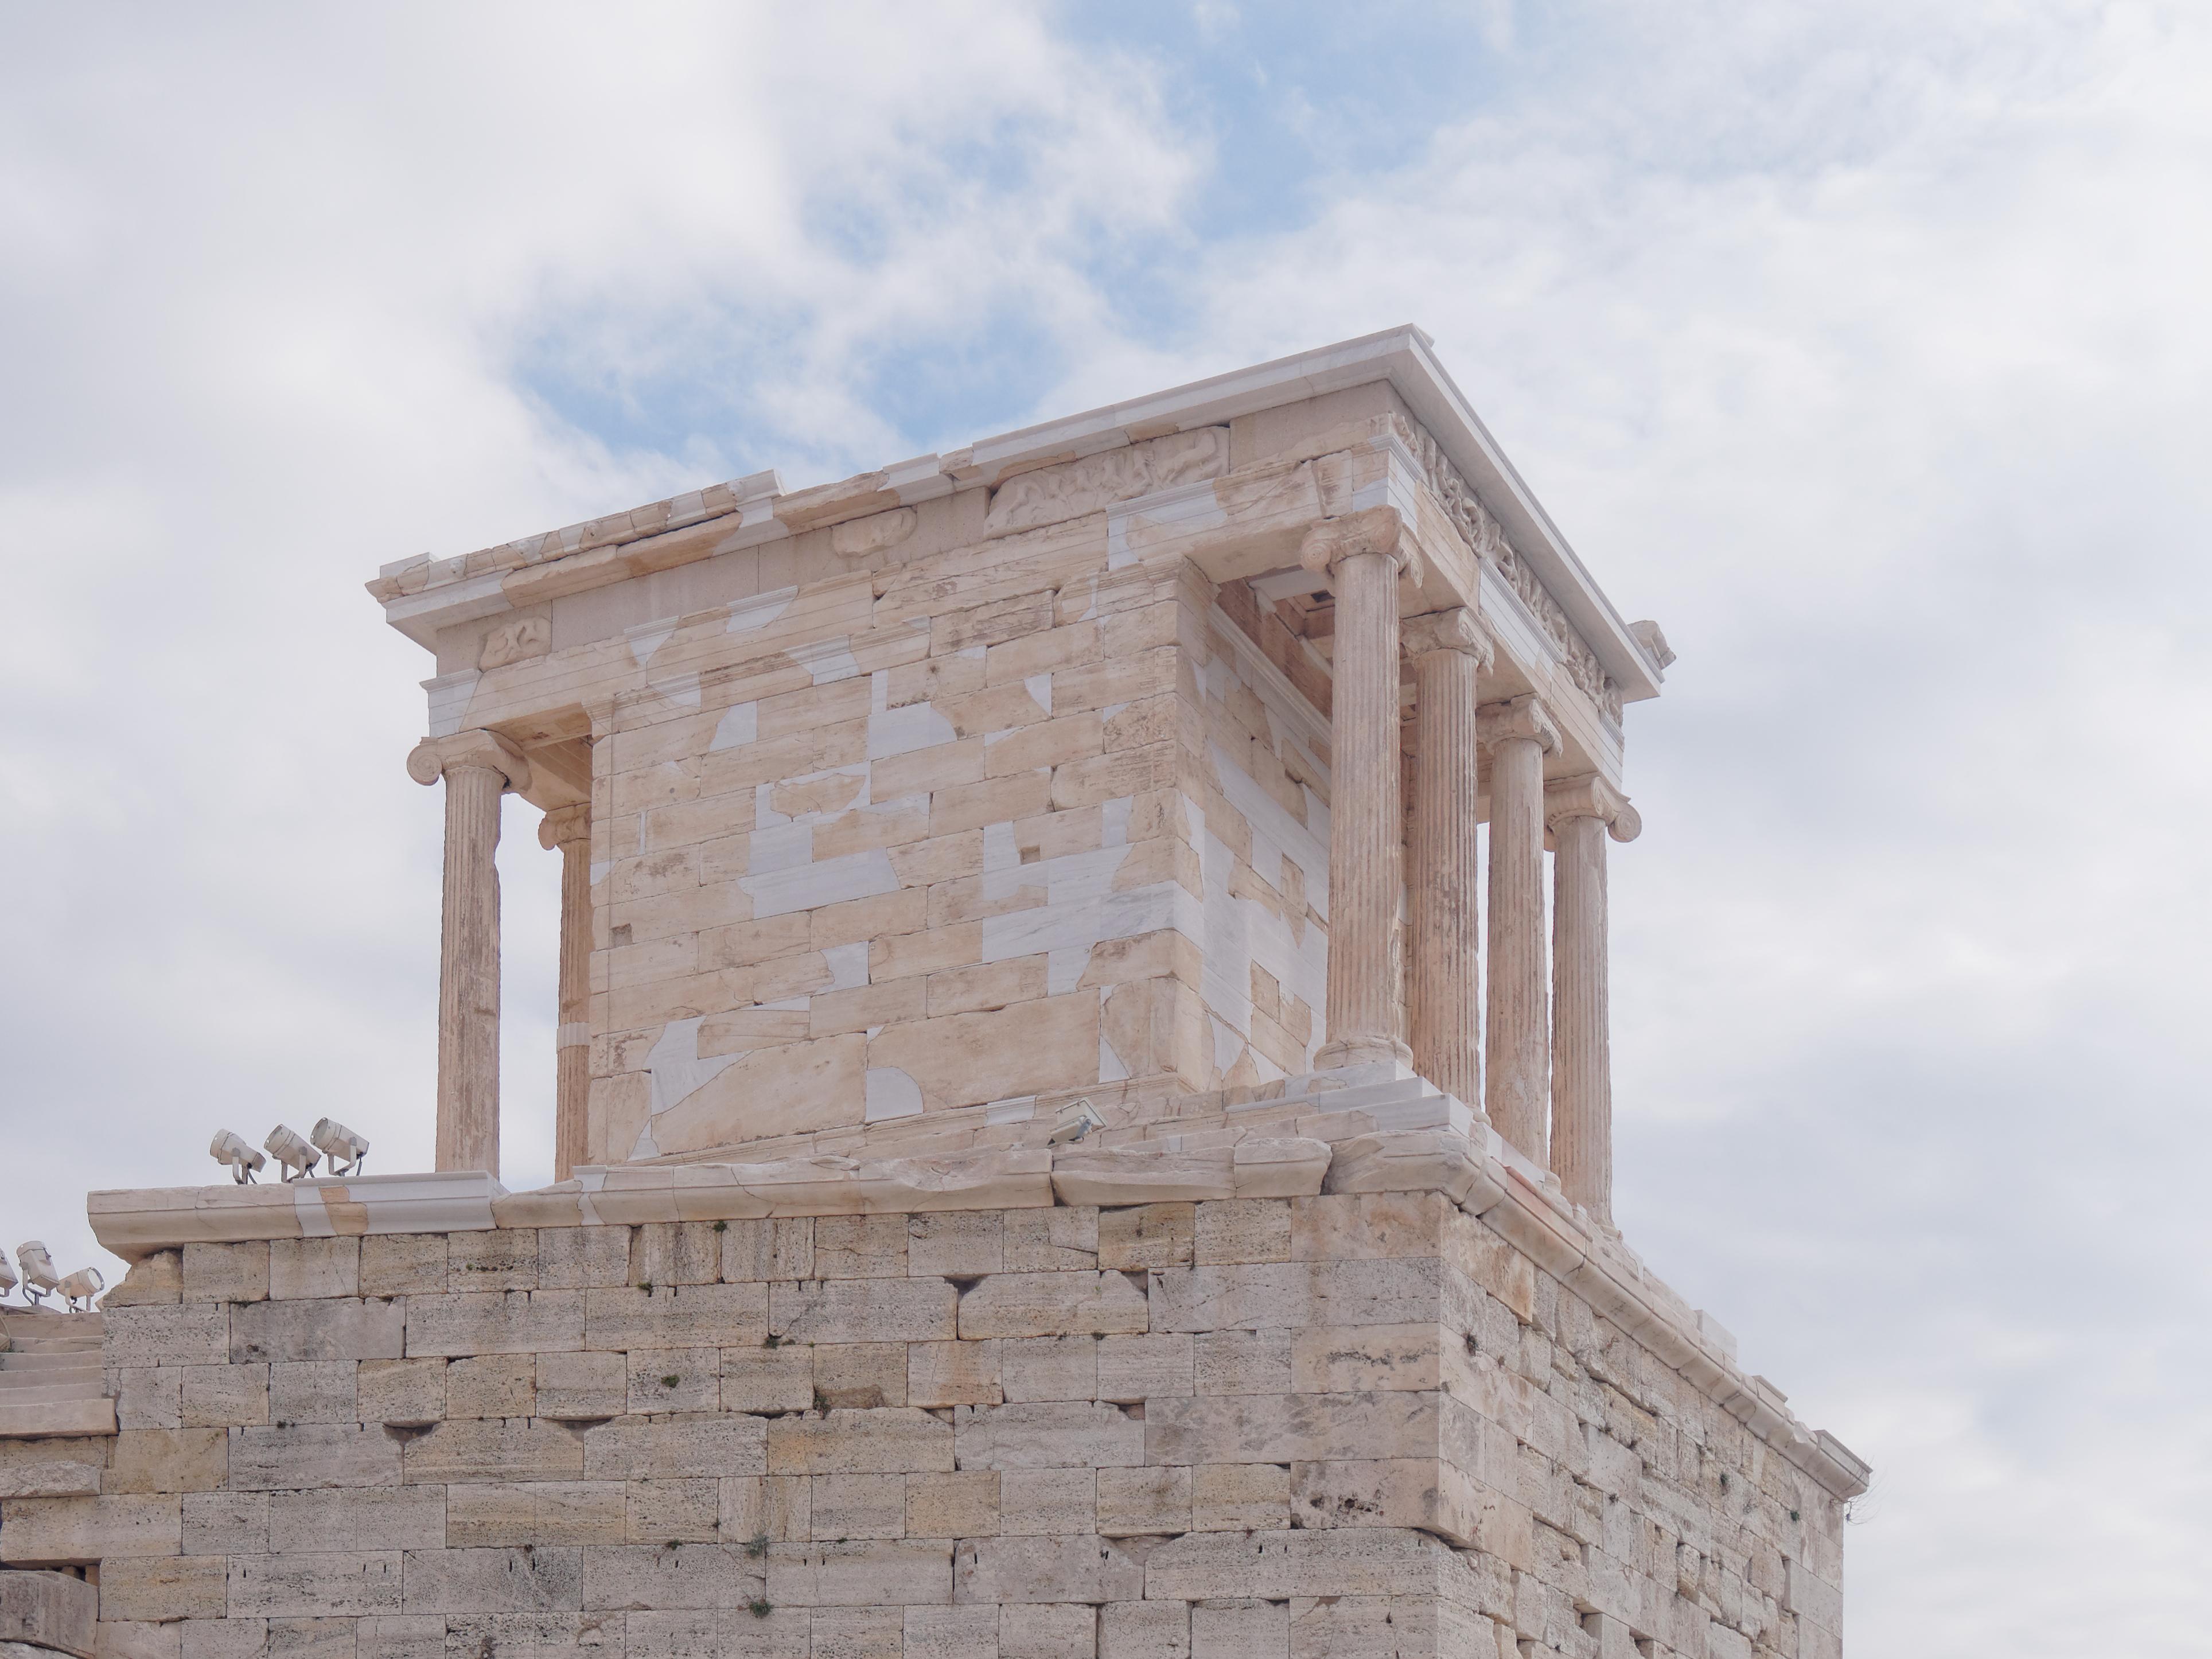 Templo De Atenea Nike Wikipedia La Enciclopedia Libre